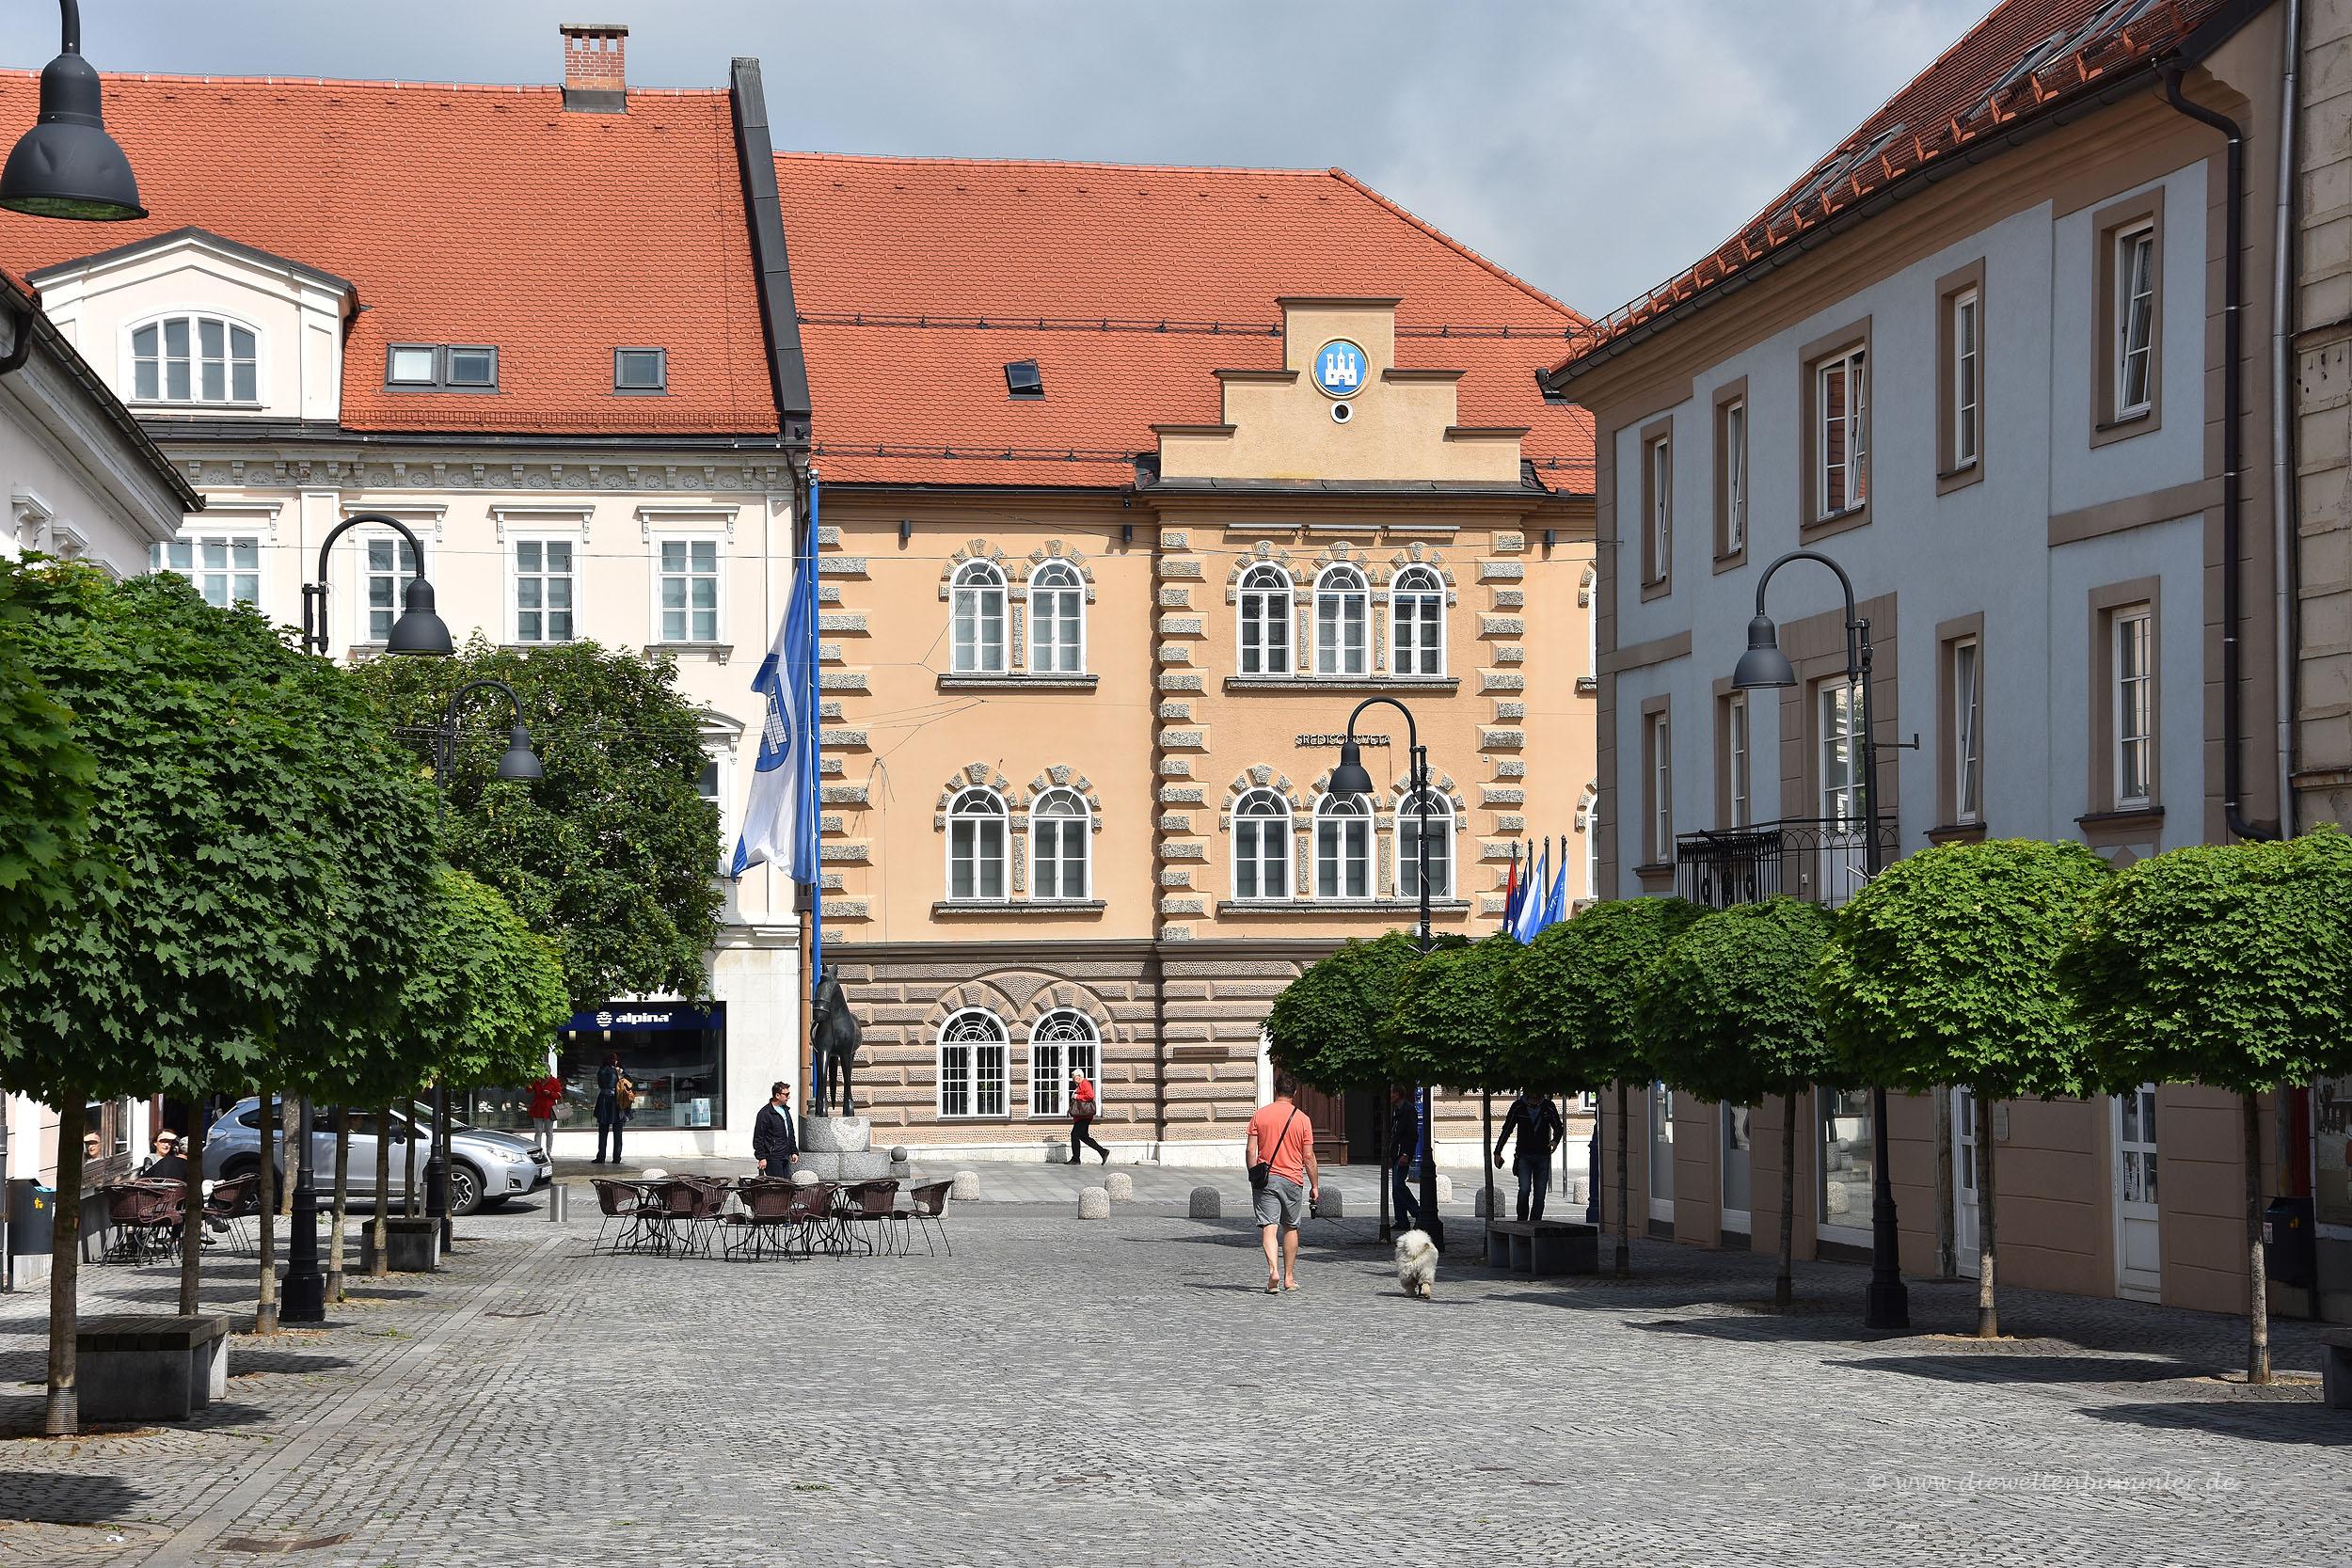 Platz in Slovenj Gradec